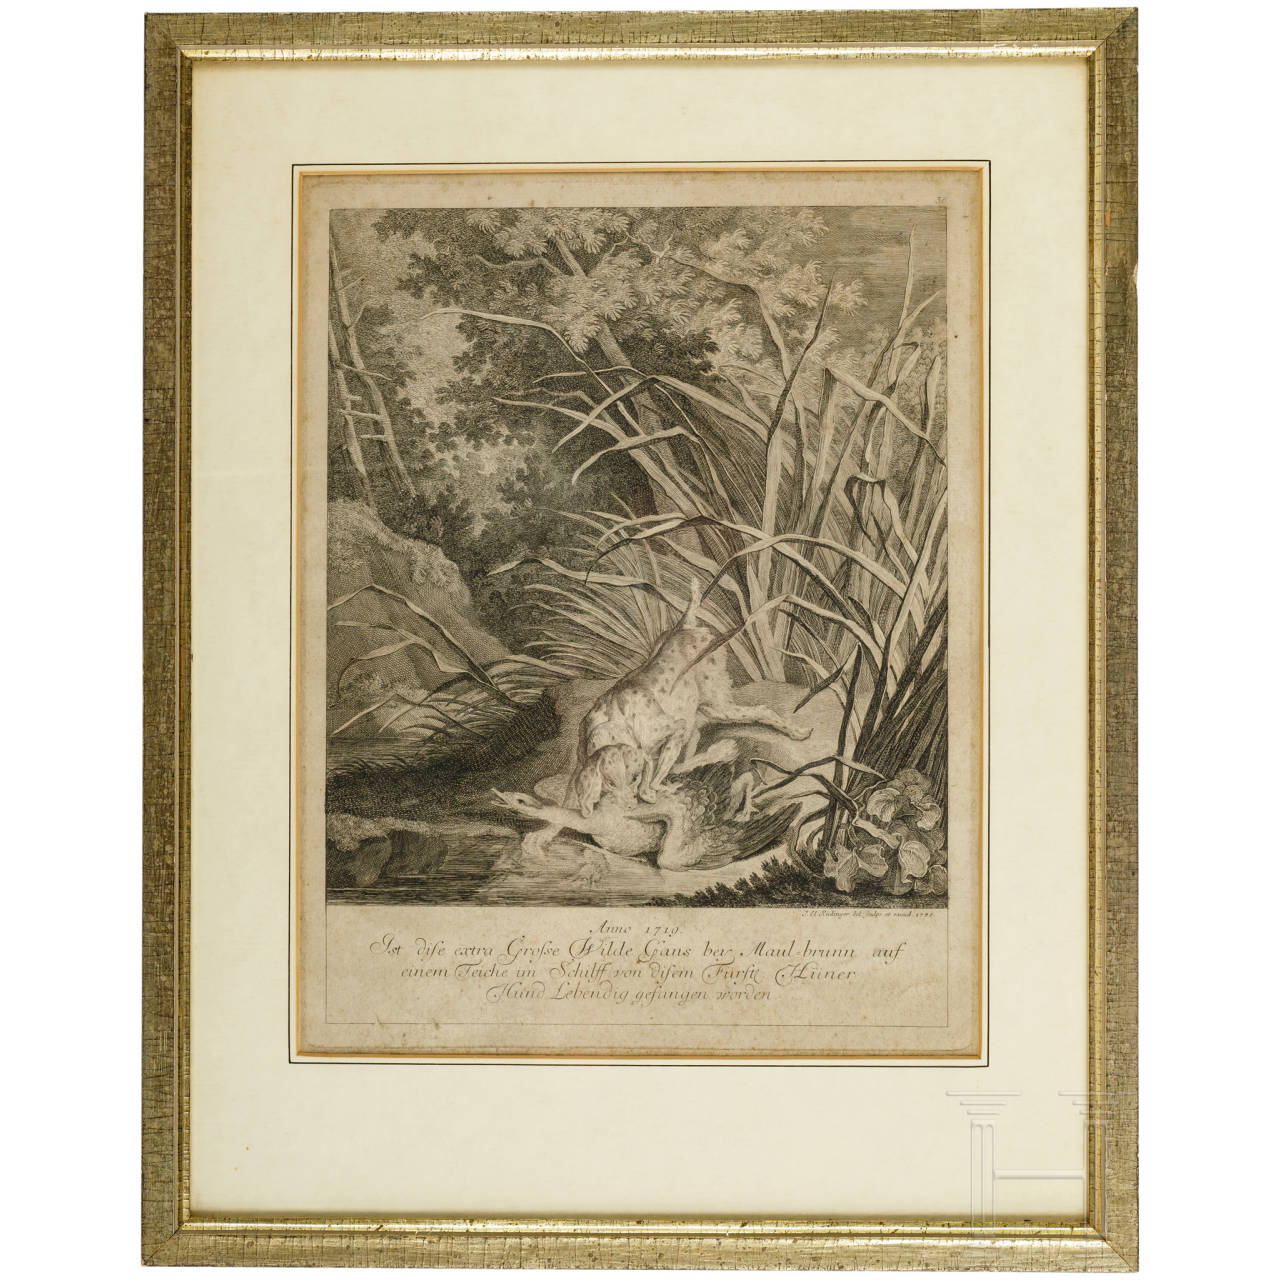 Jagdlicher Kupferstich, Johann Elias Ridinger (1698 - 1767), datiert 1745